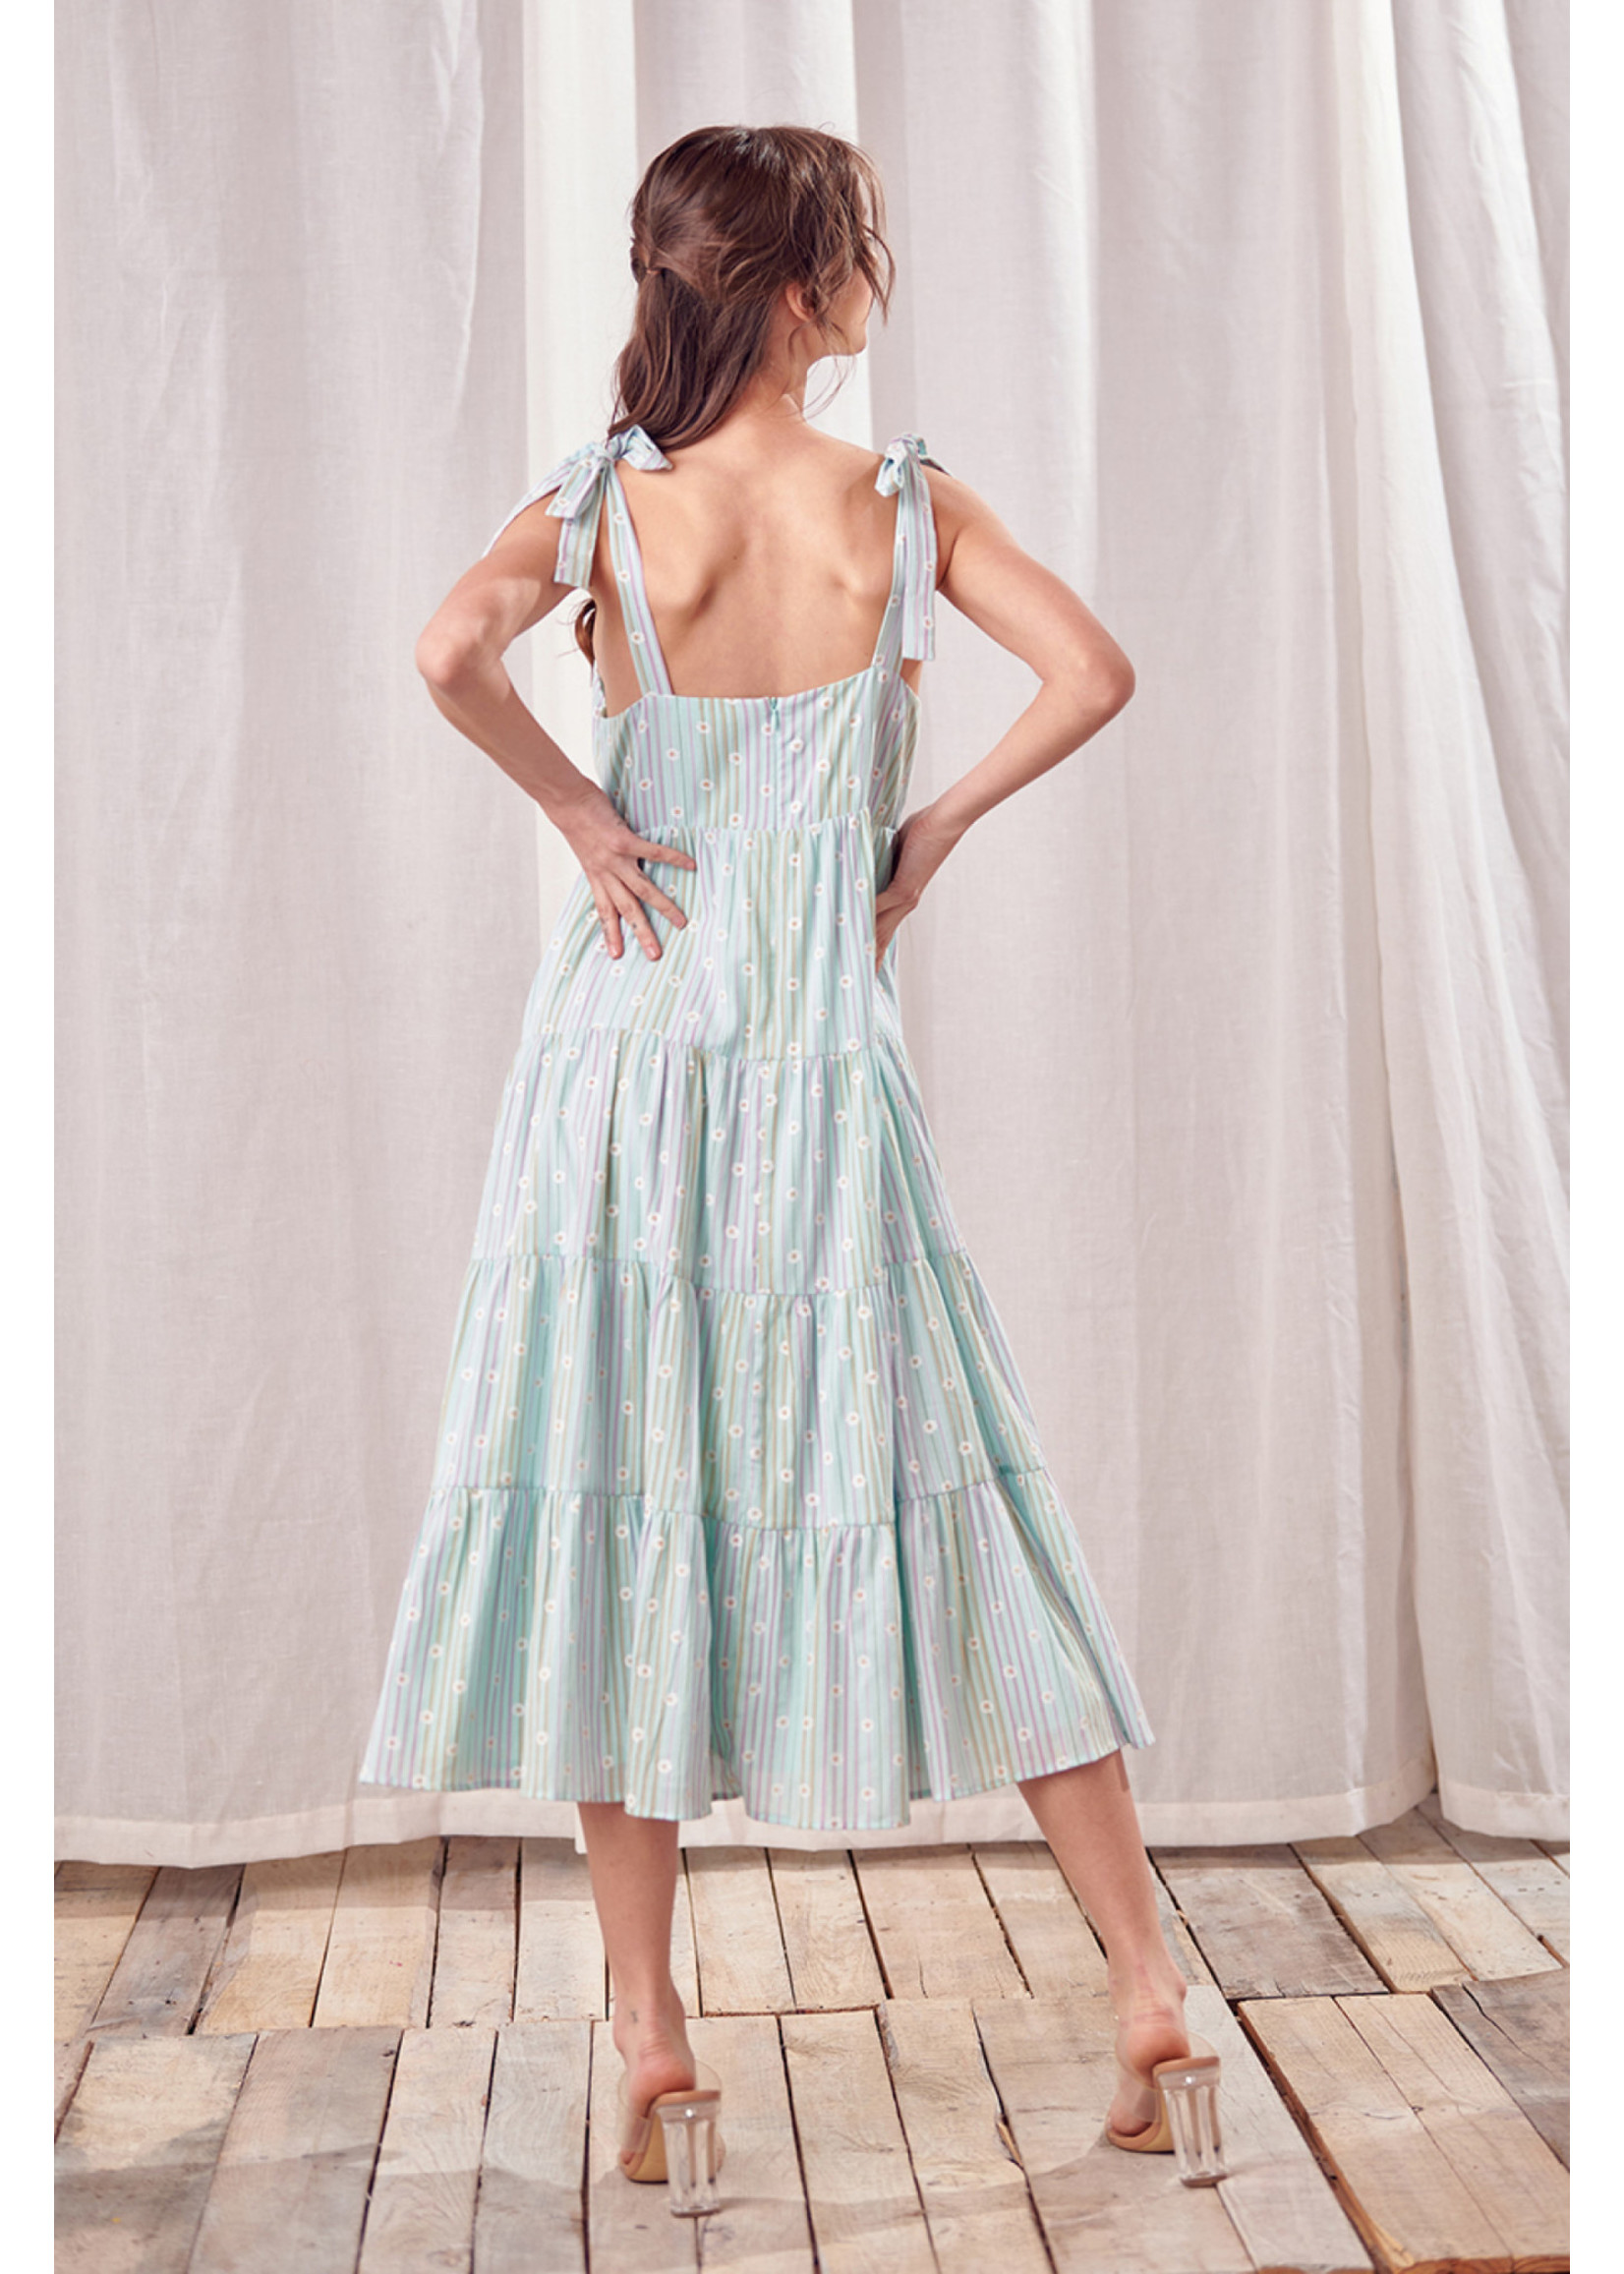 Storia Daisy Print and Striped Midi Dress - JD3065A